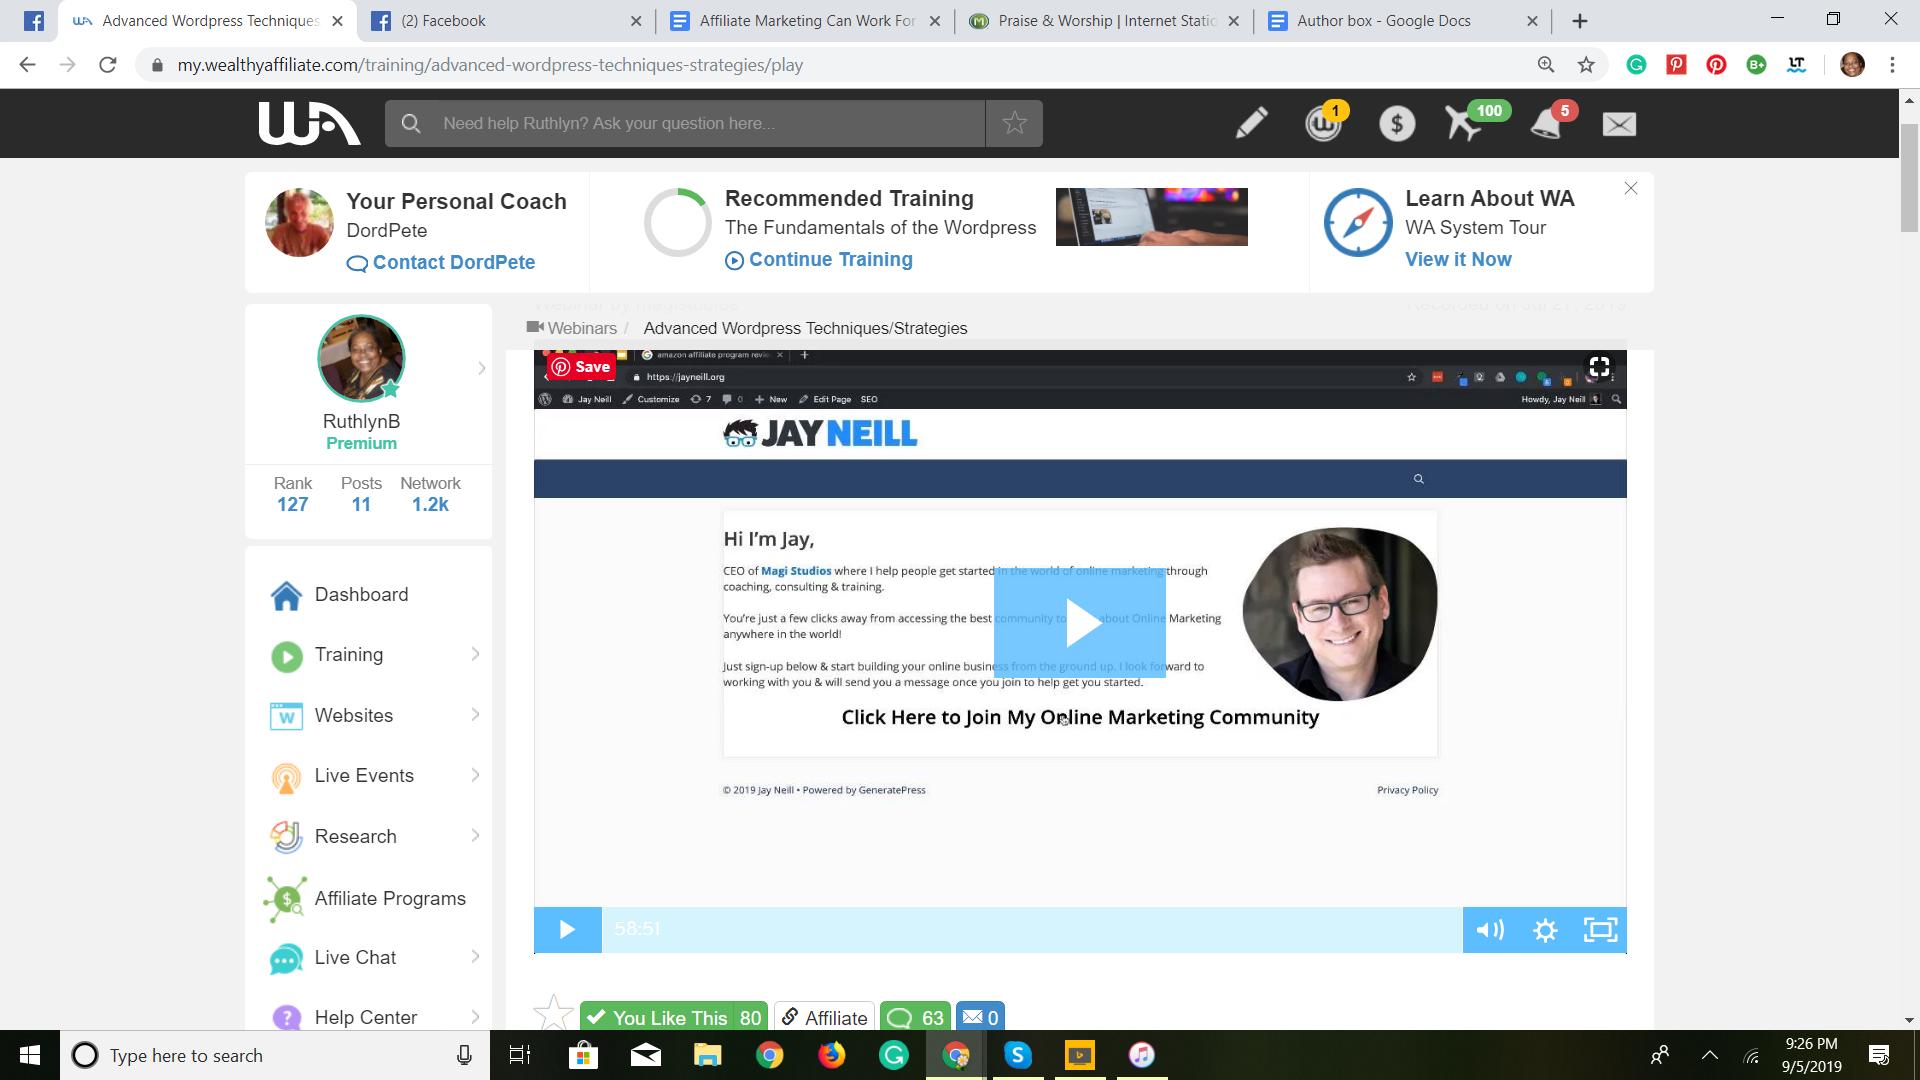 Advanced WordPress techniques